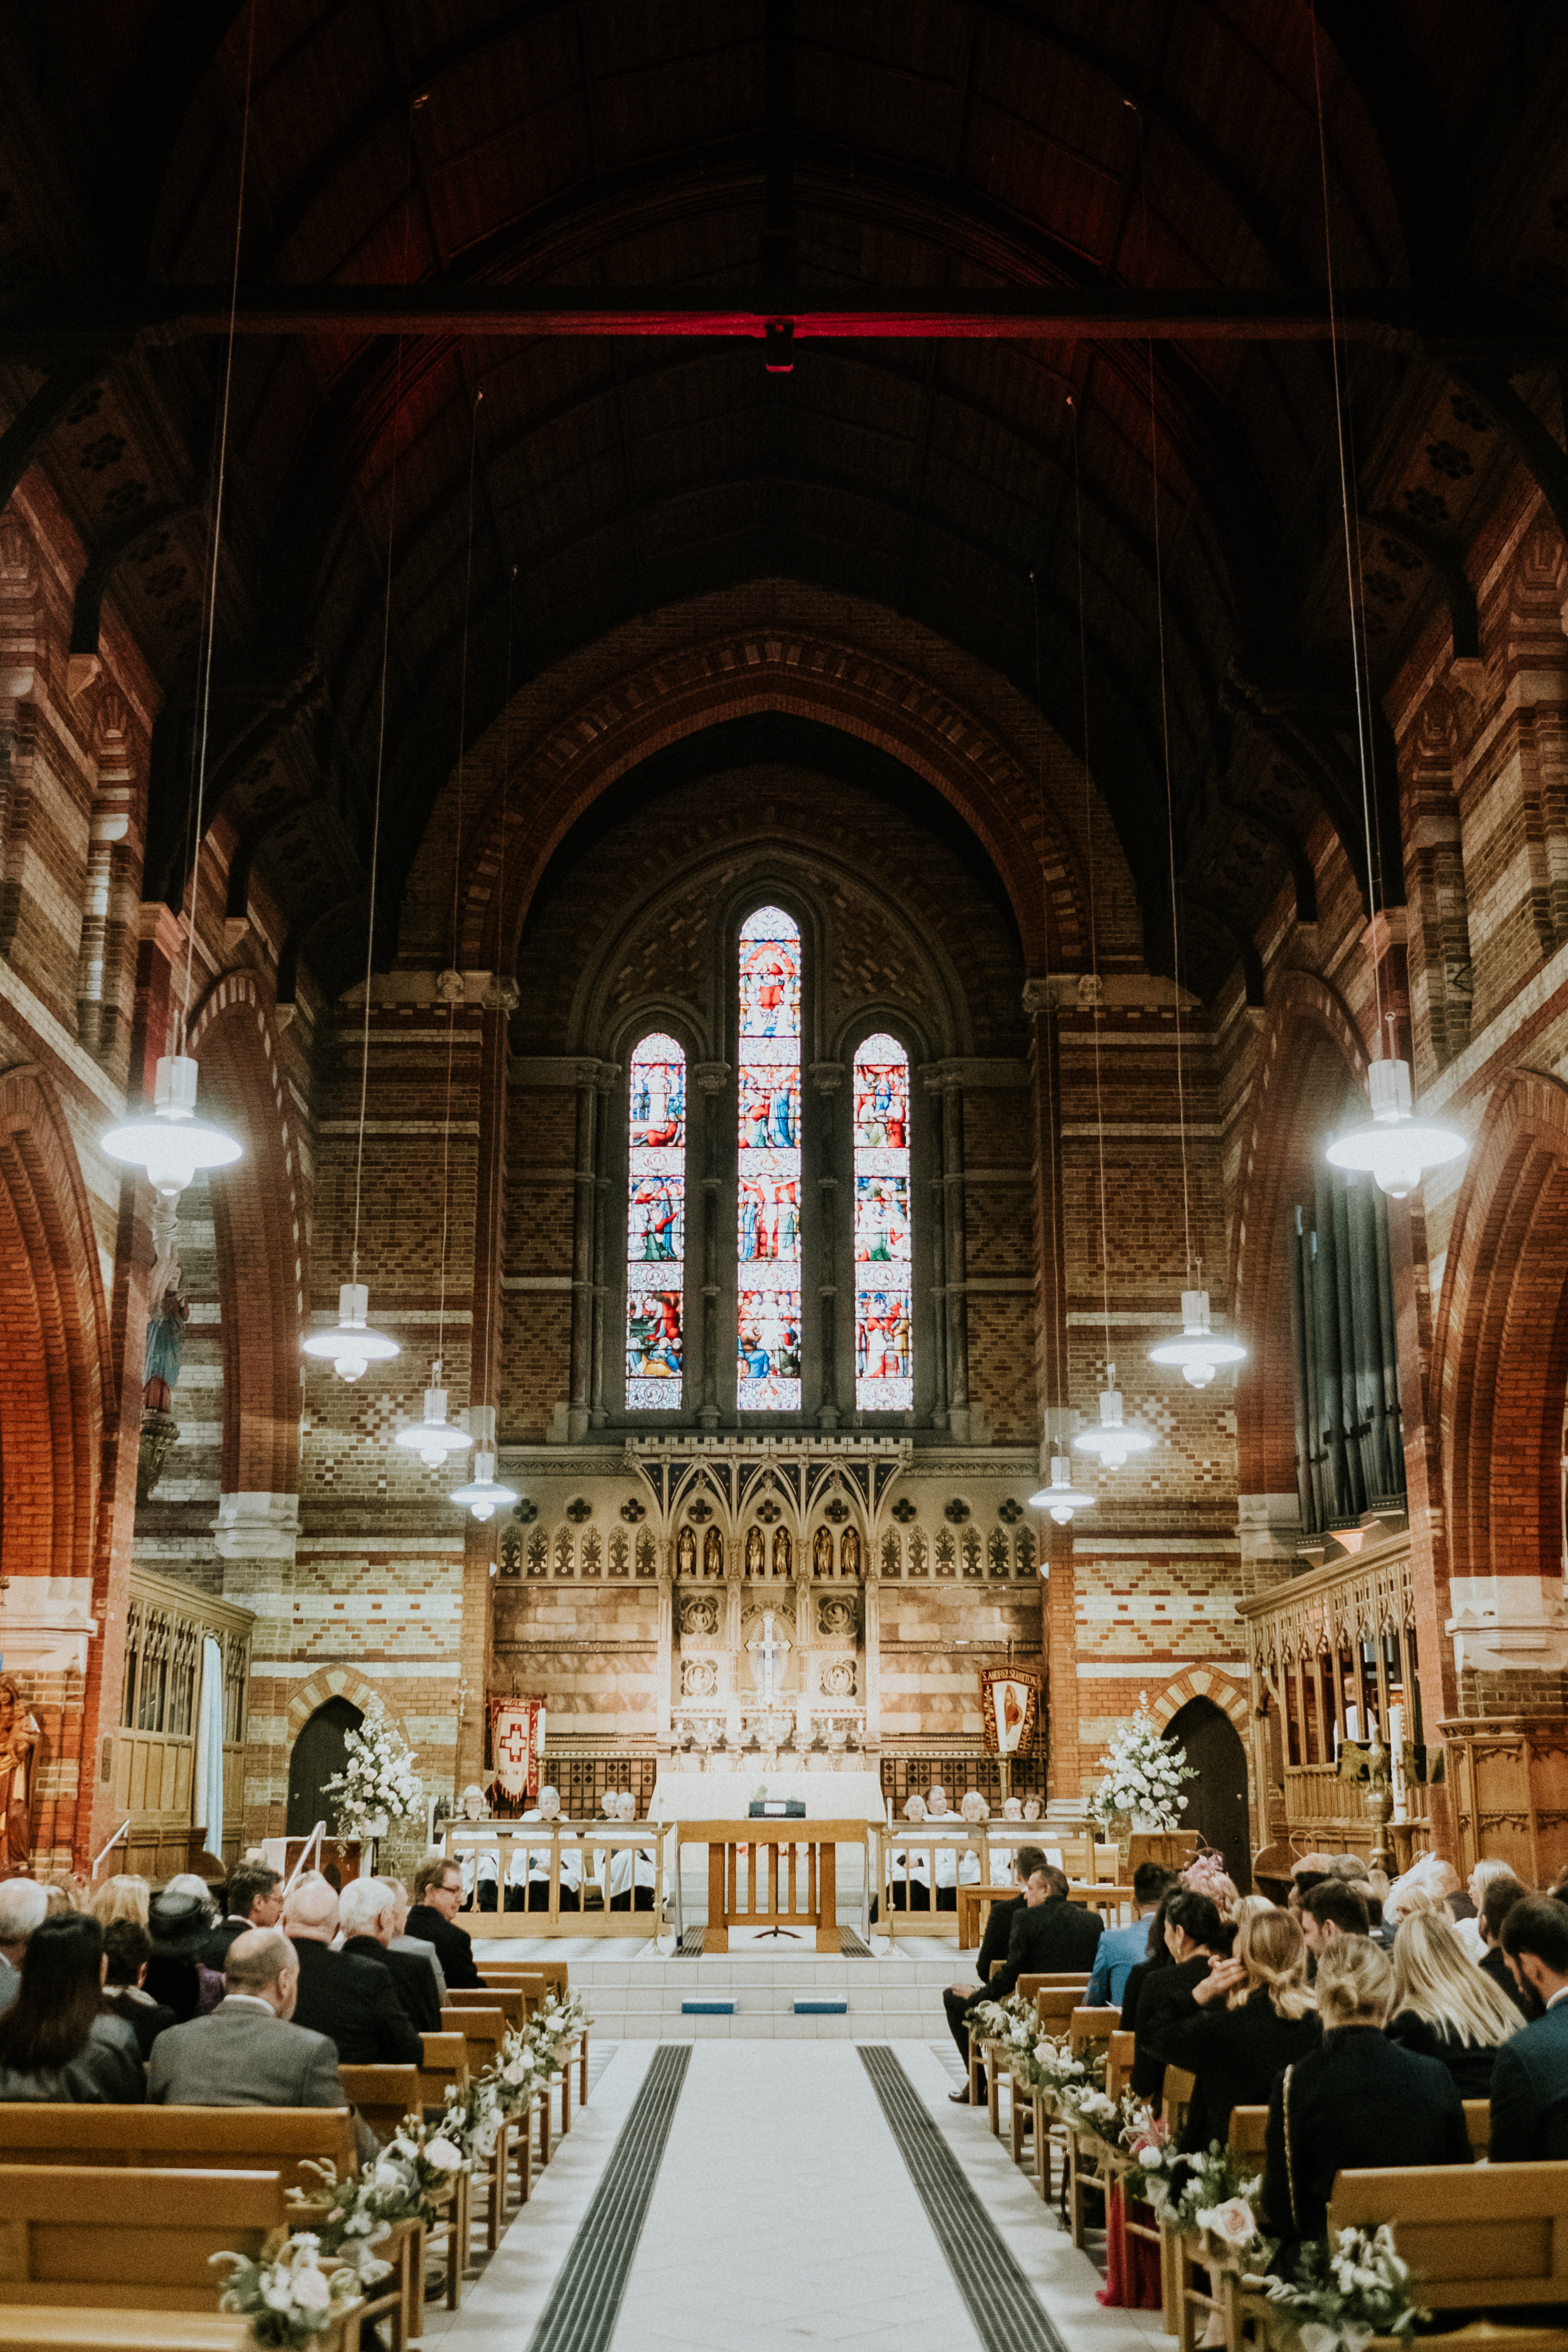 Lottie_Teddington_wedding_church_flowers.jpg